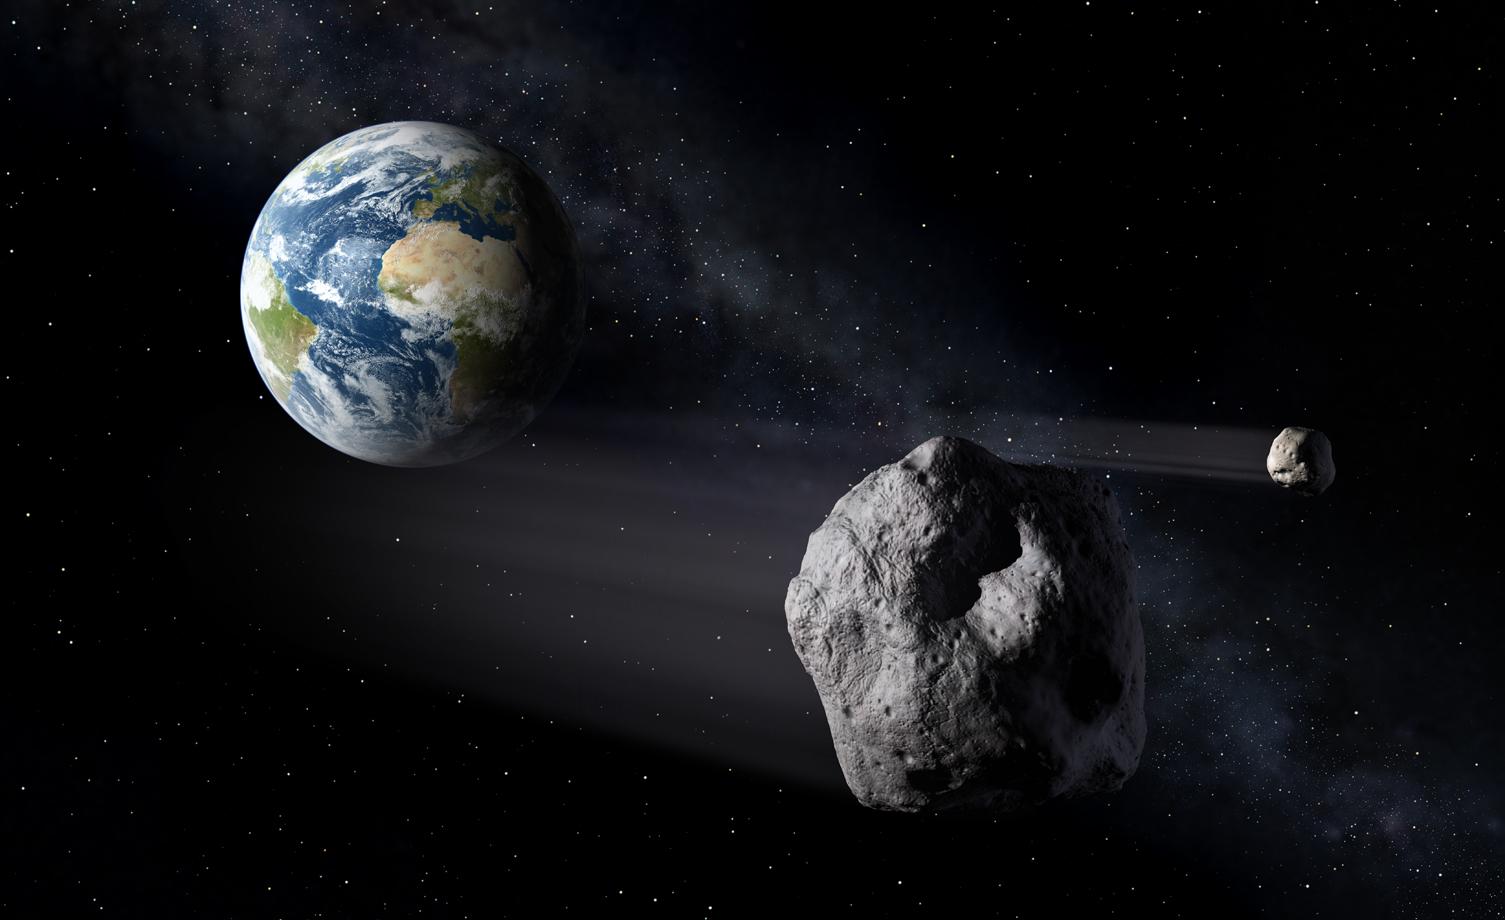 asteroide pasando la tierra